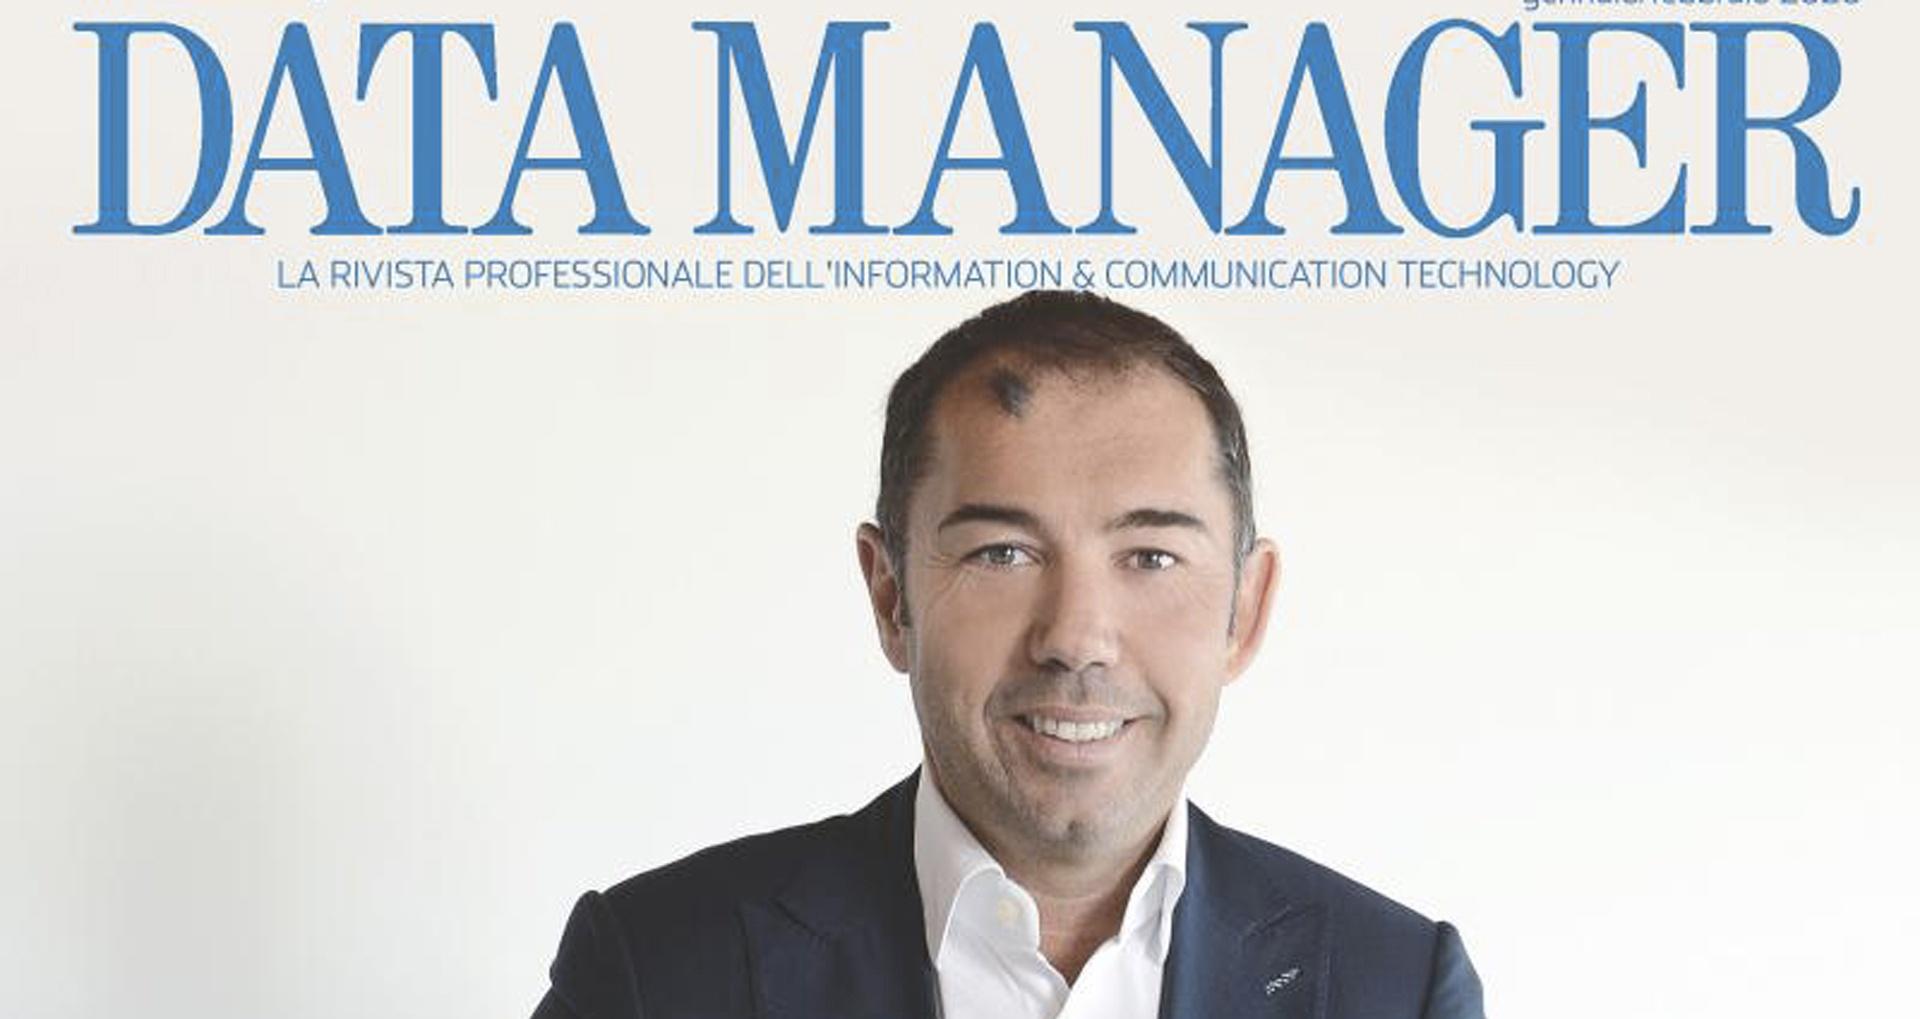 Data Manager cover story Gruppo Filippetti